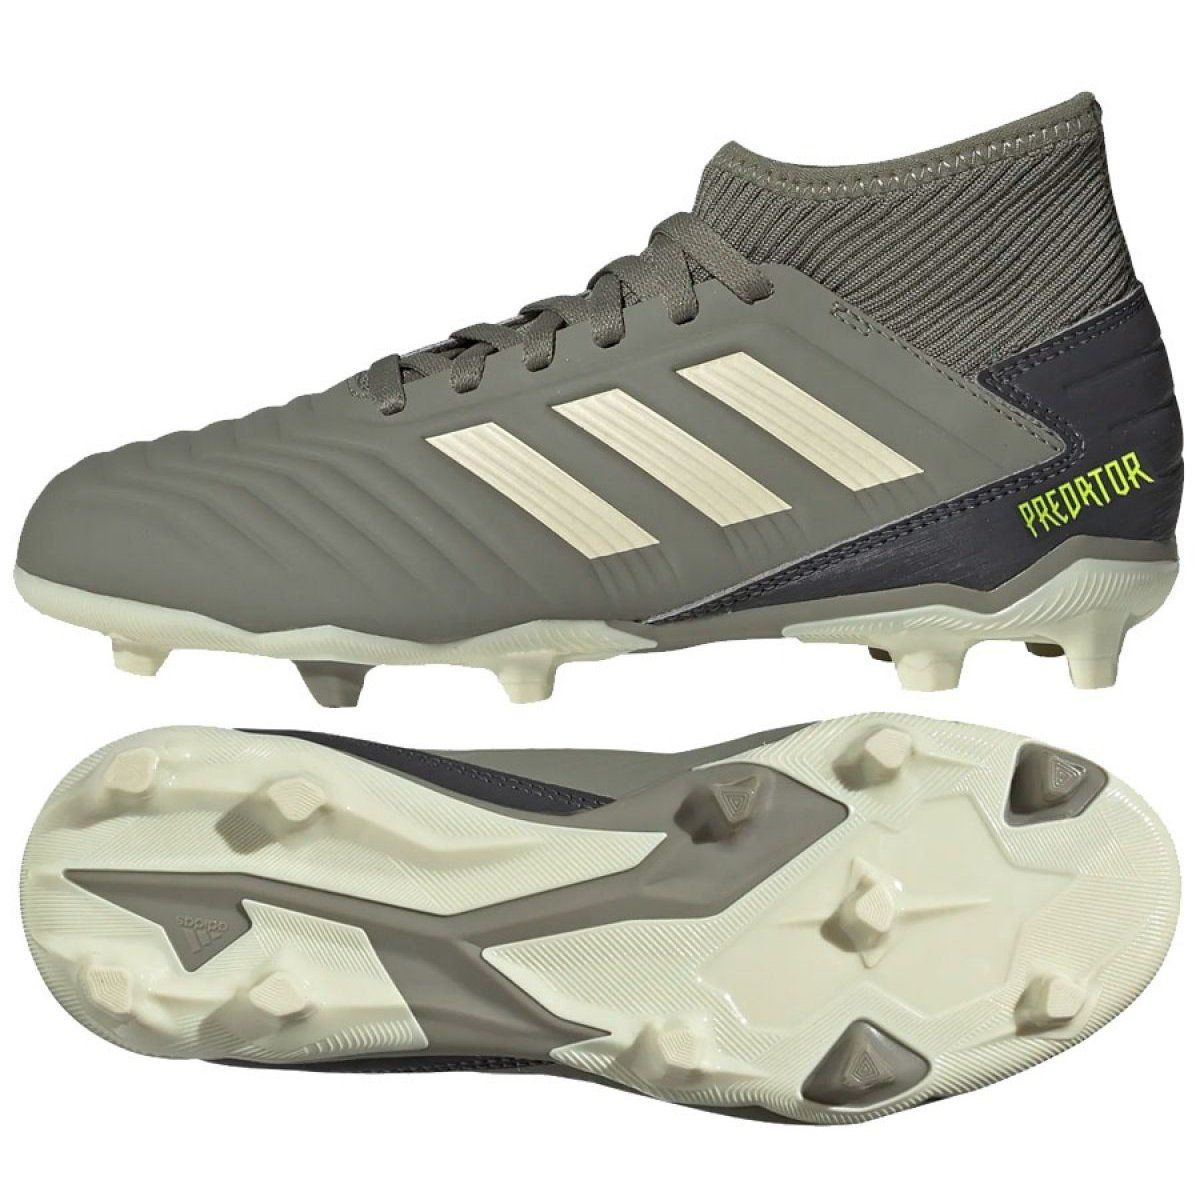 Buty Pilkarskie Adidas Predator 19 3 Fg Jr Ef8215 Szare Football Shoes Adidas Adidas Predator